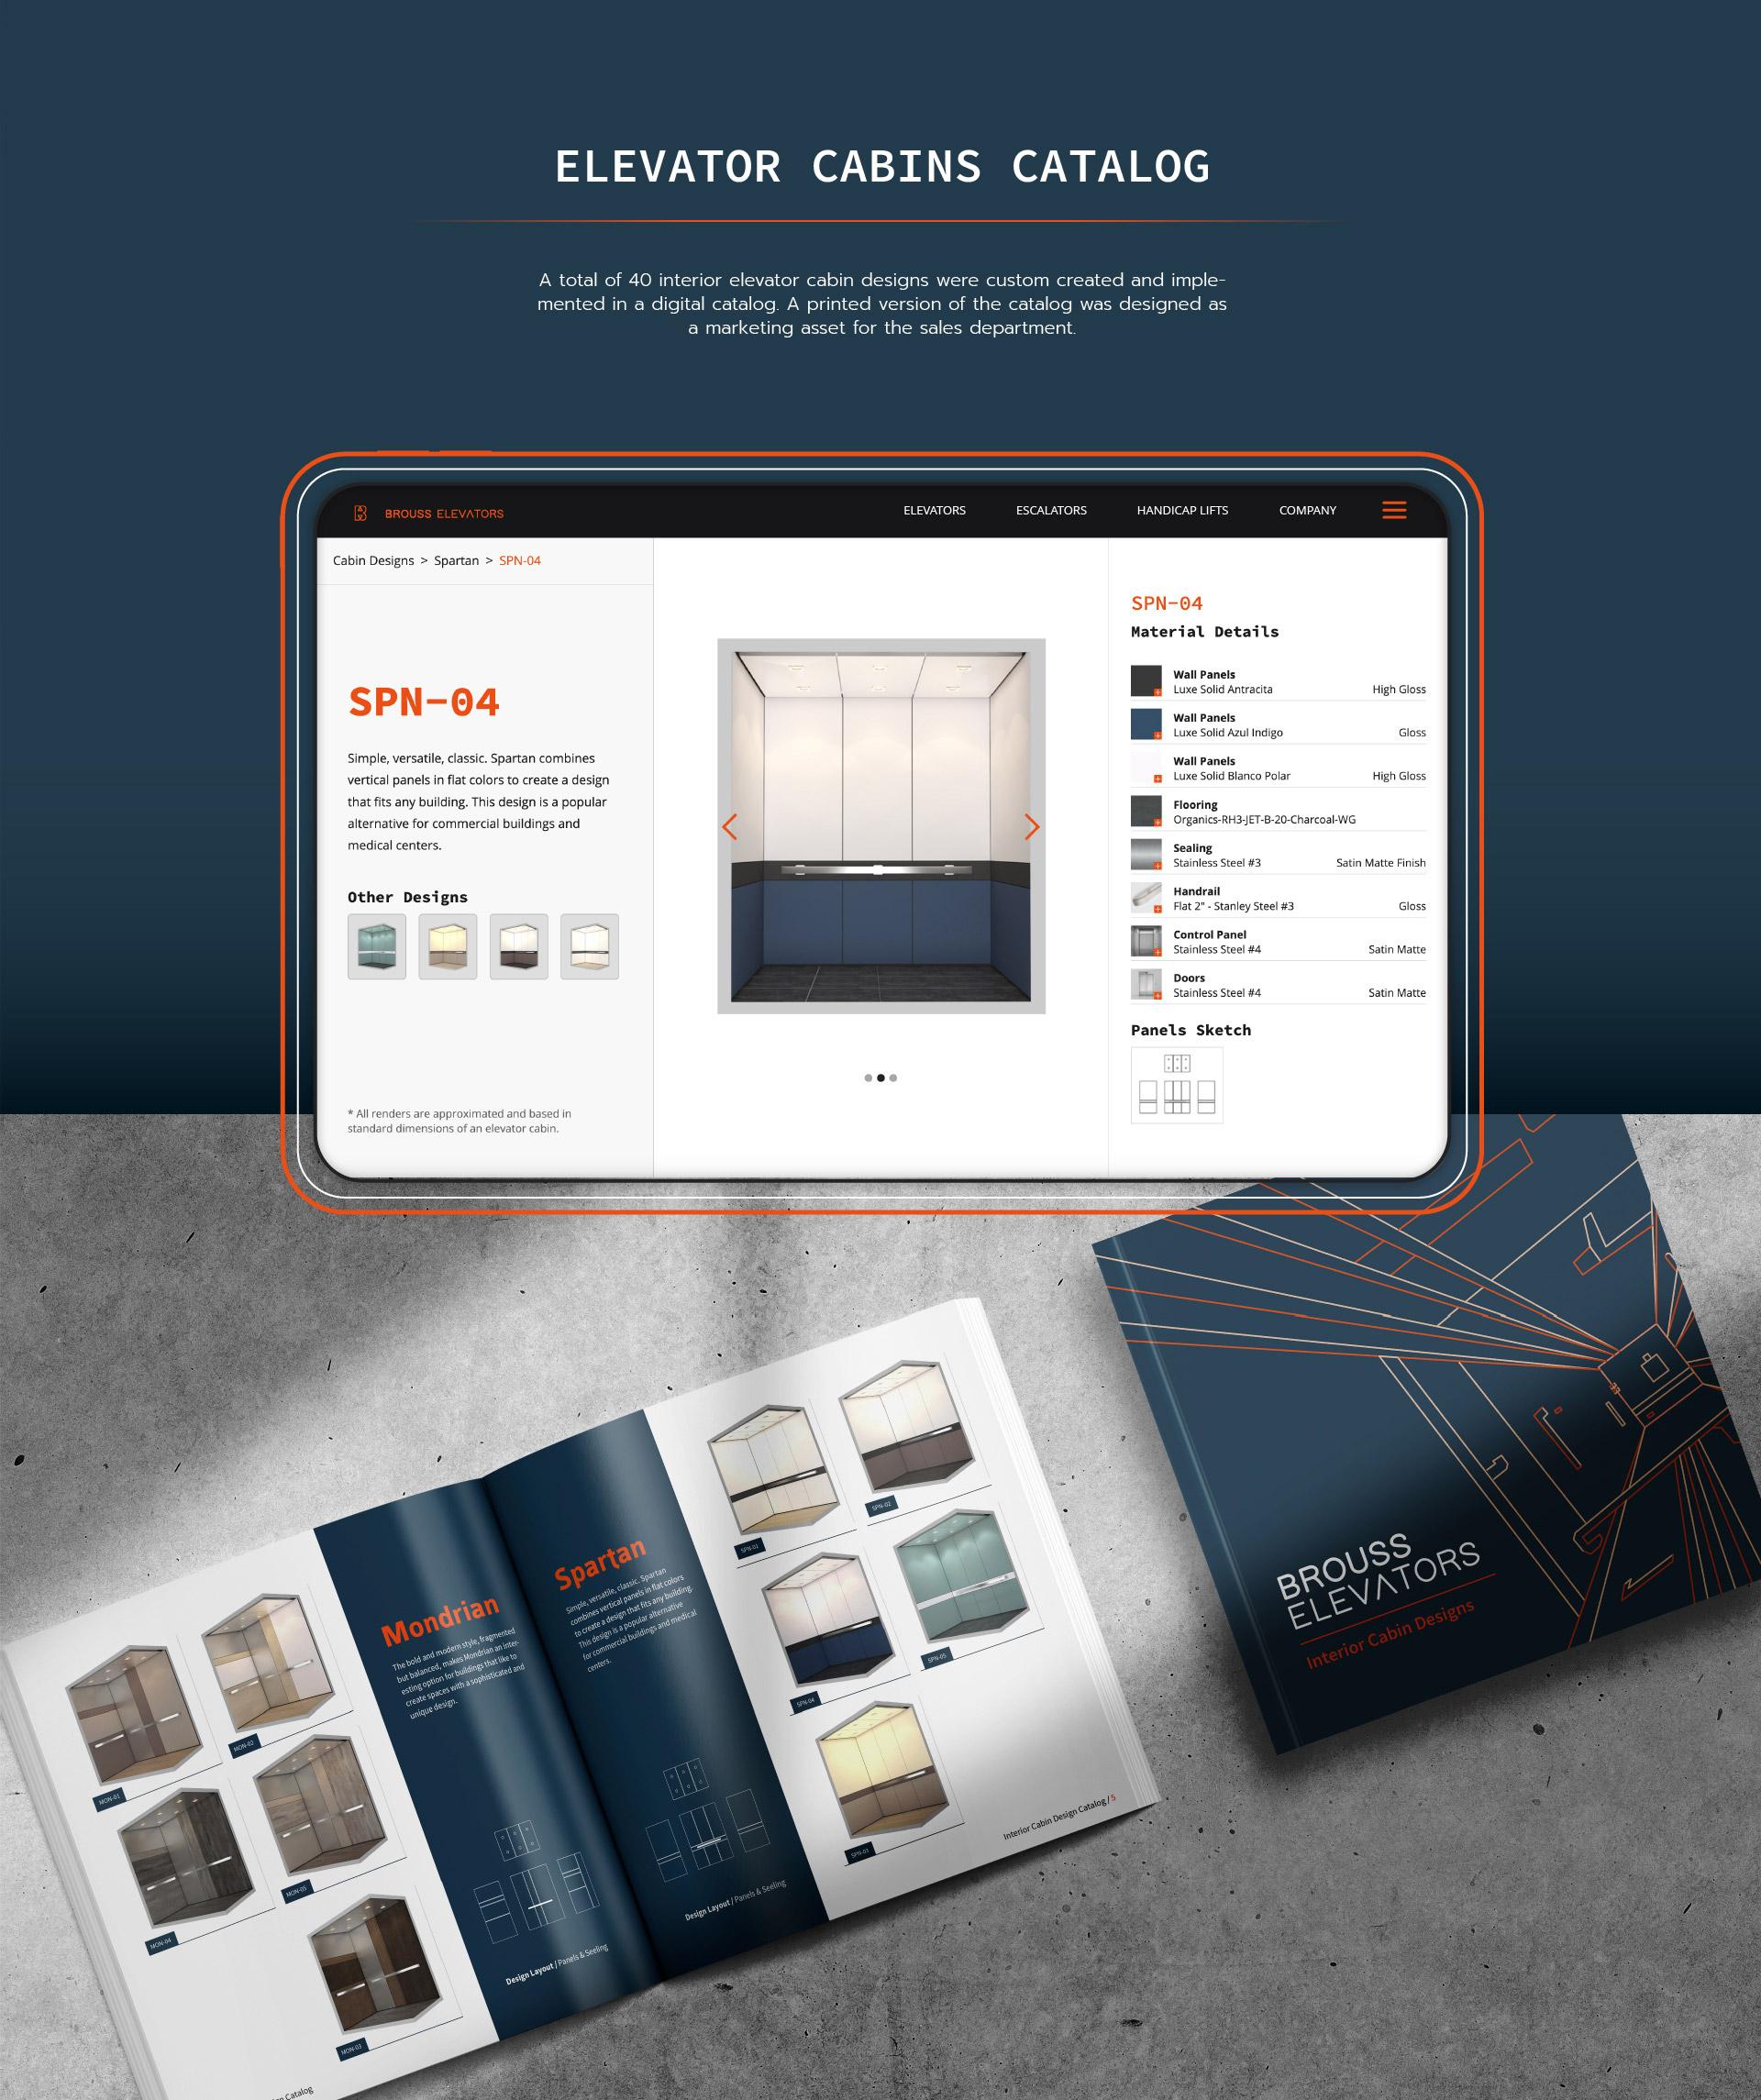 Brouss Elevators digital catalog development by Kinetik Lab